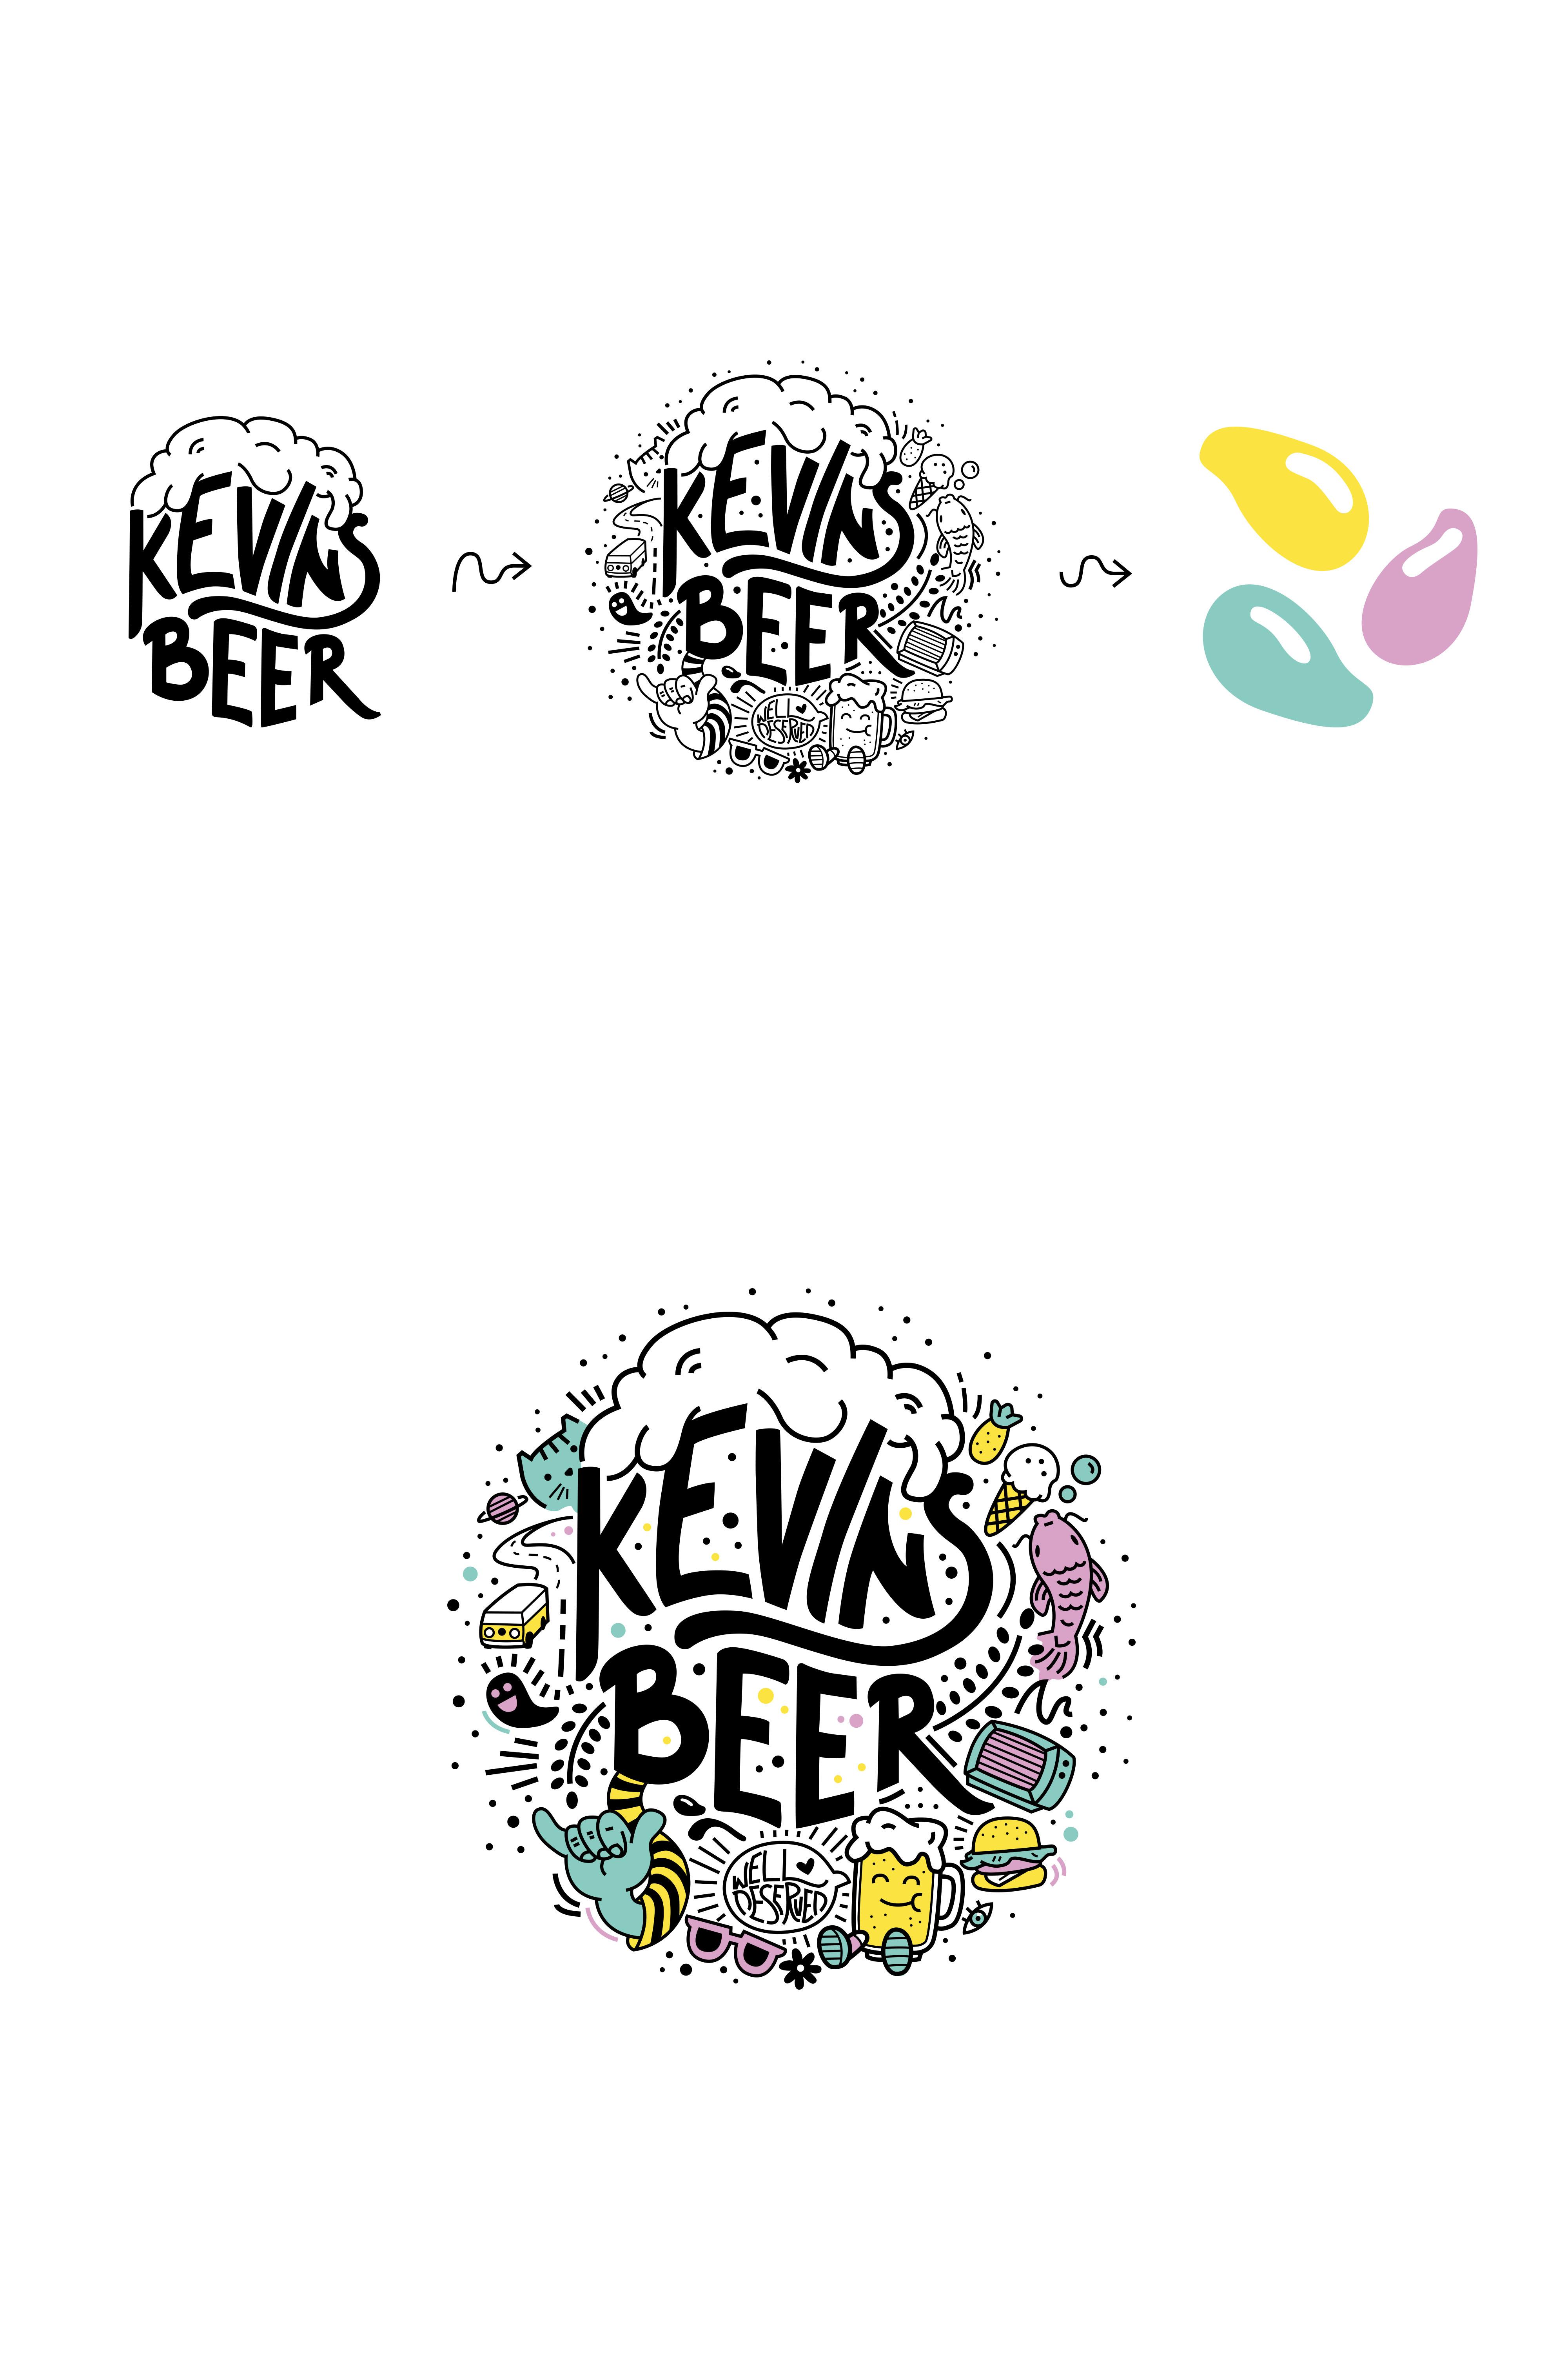 Kevins_Beer_armanda-asani.ch_Logo_RZ_2